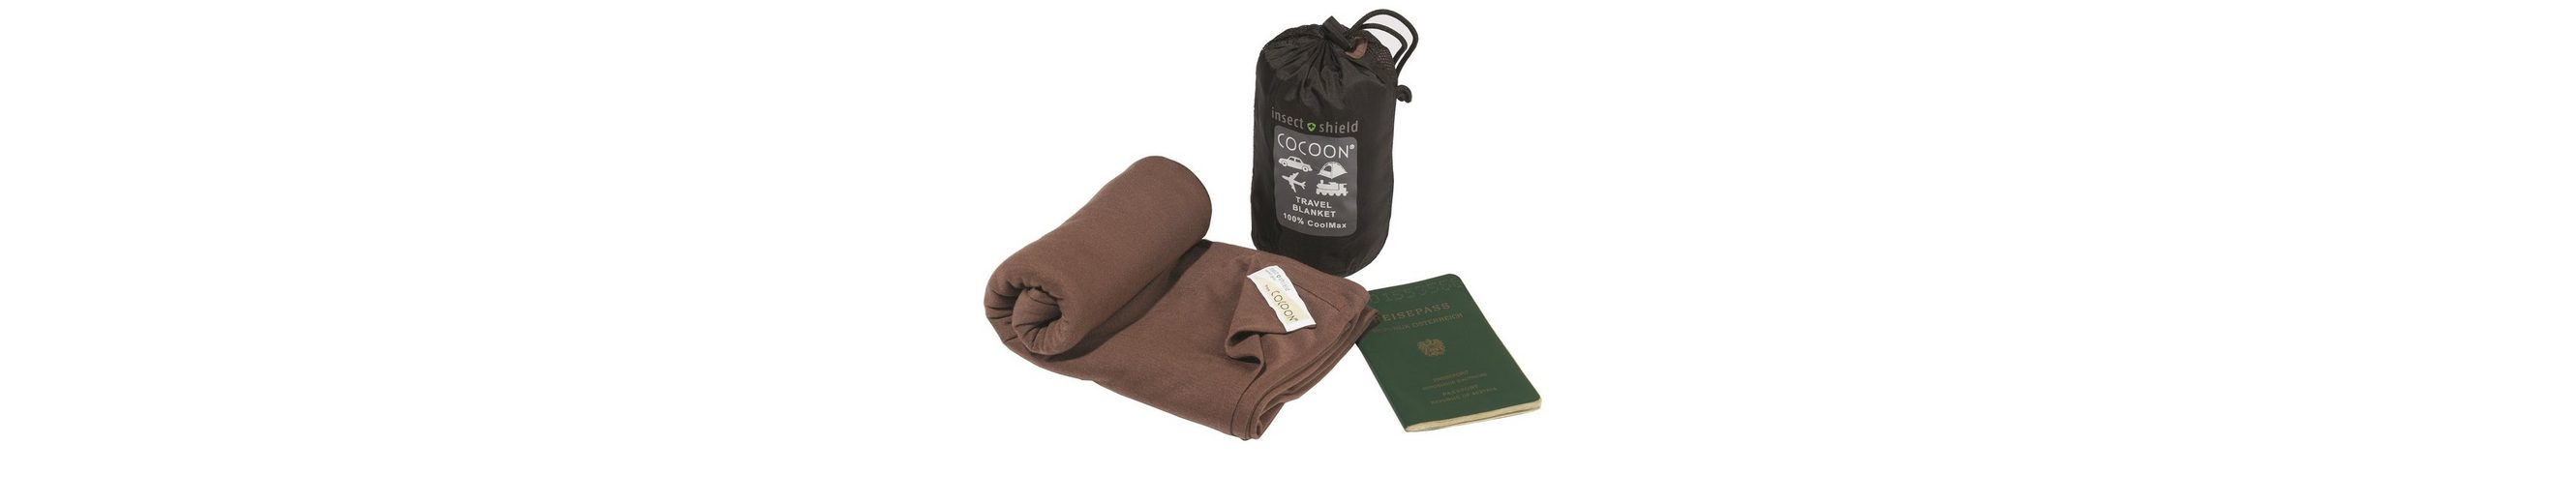 Cocoon Reisedecke »Insect Shield Travel Blanket CoolMax«